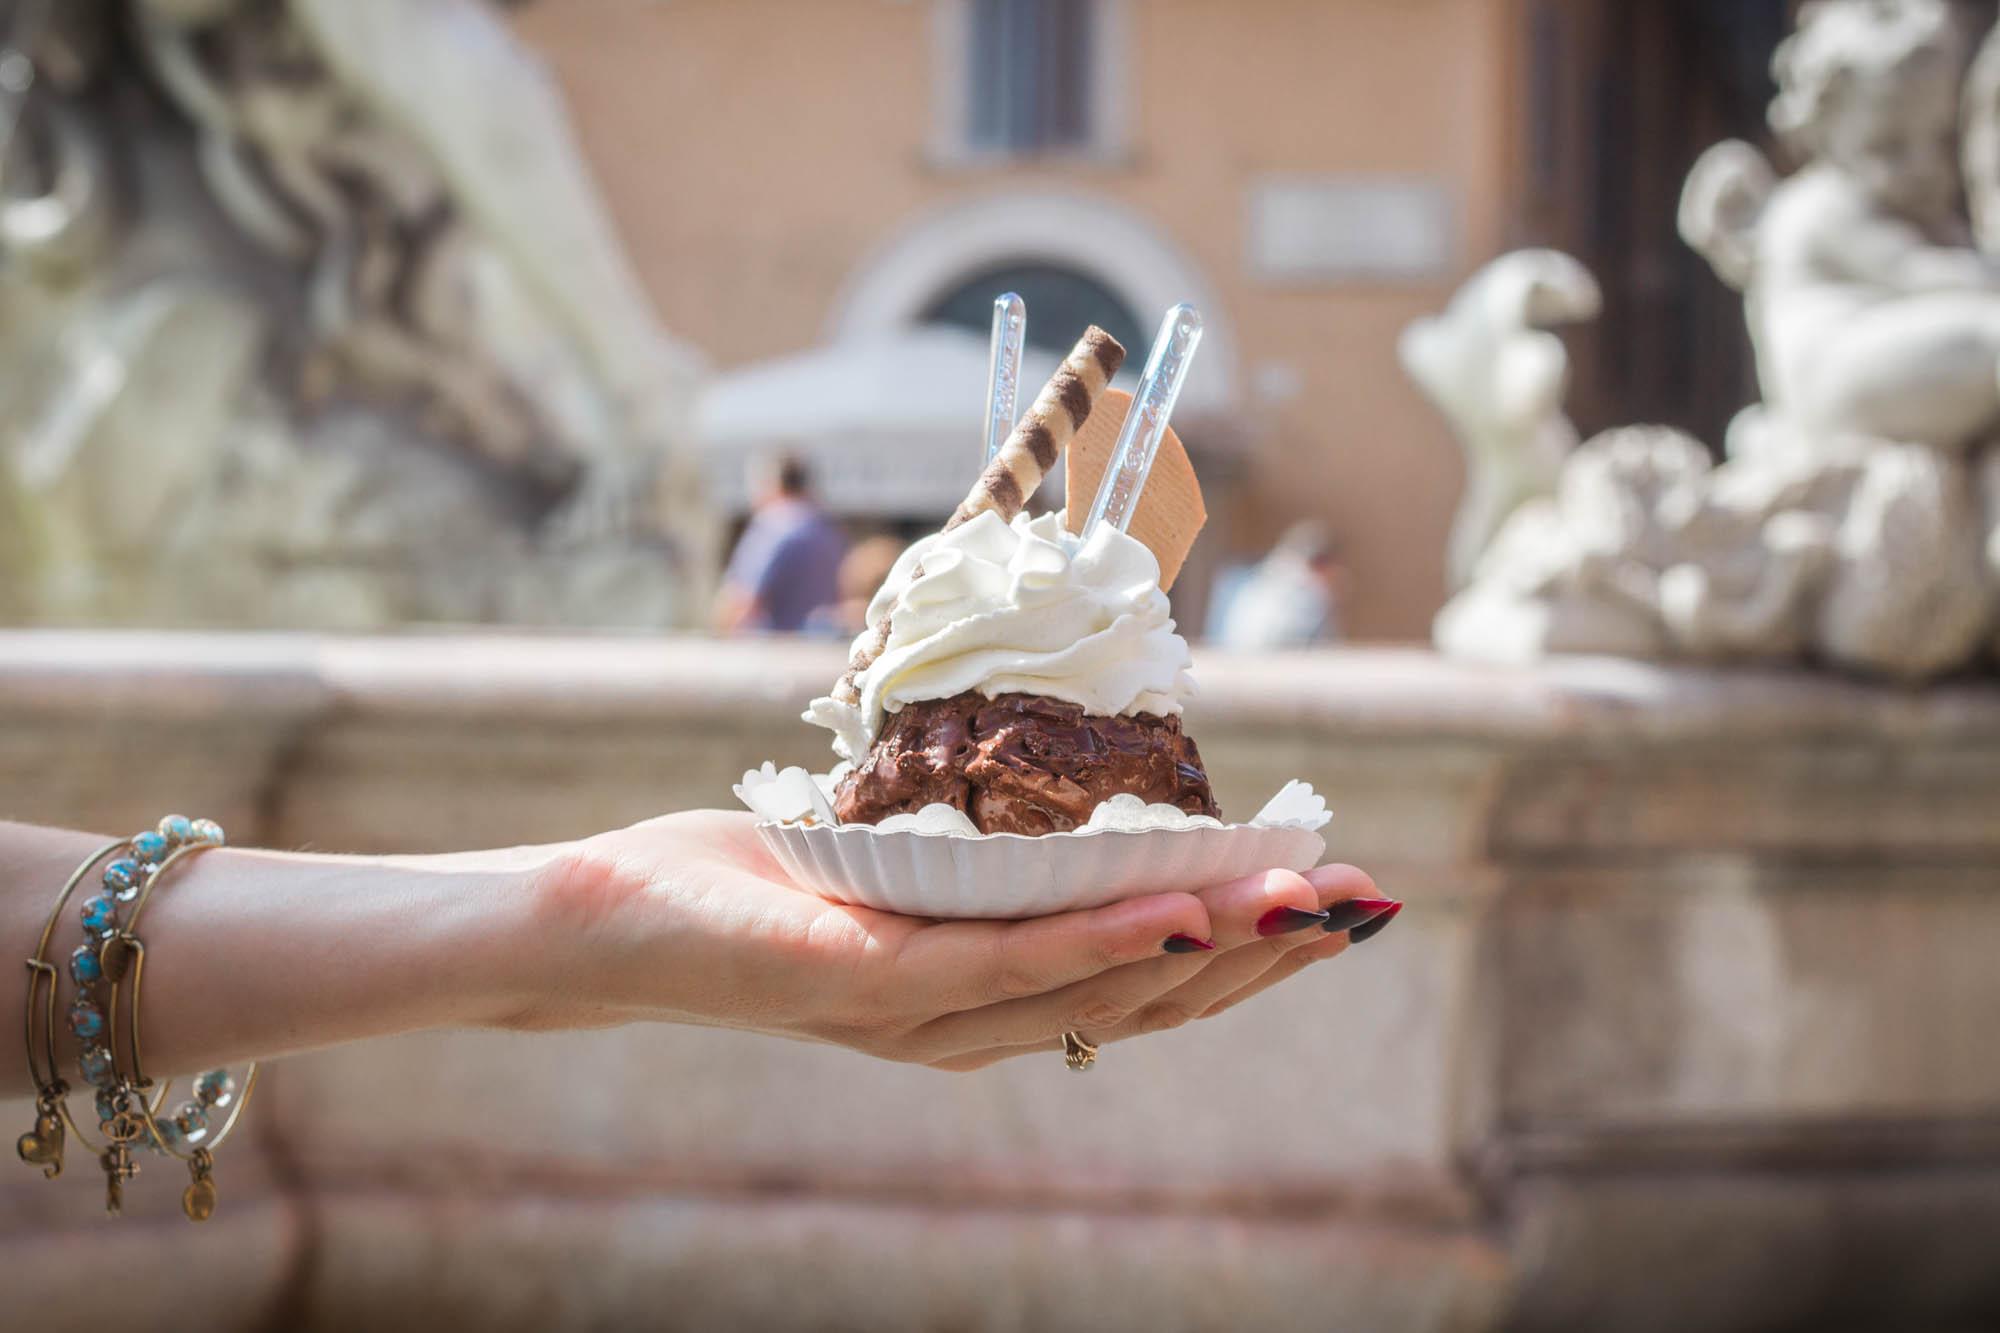 Tre Scalini dessert in Rome, Italy